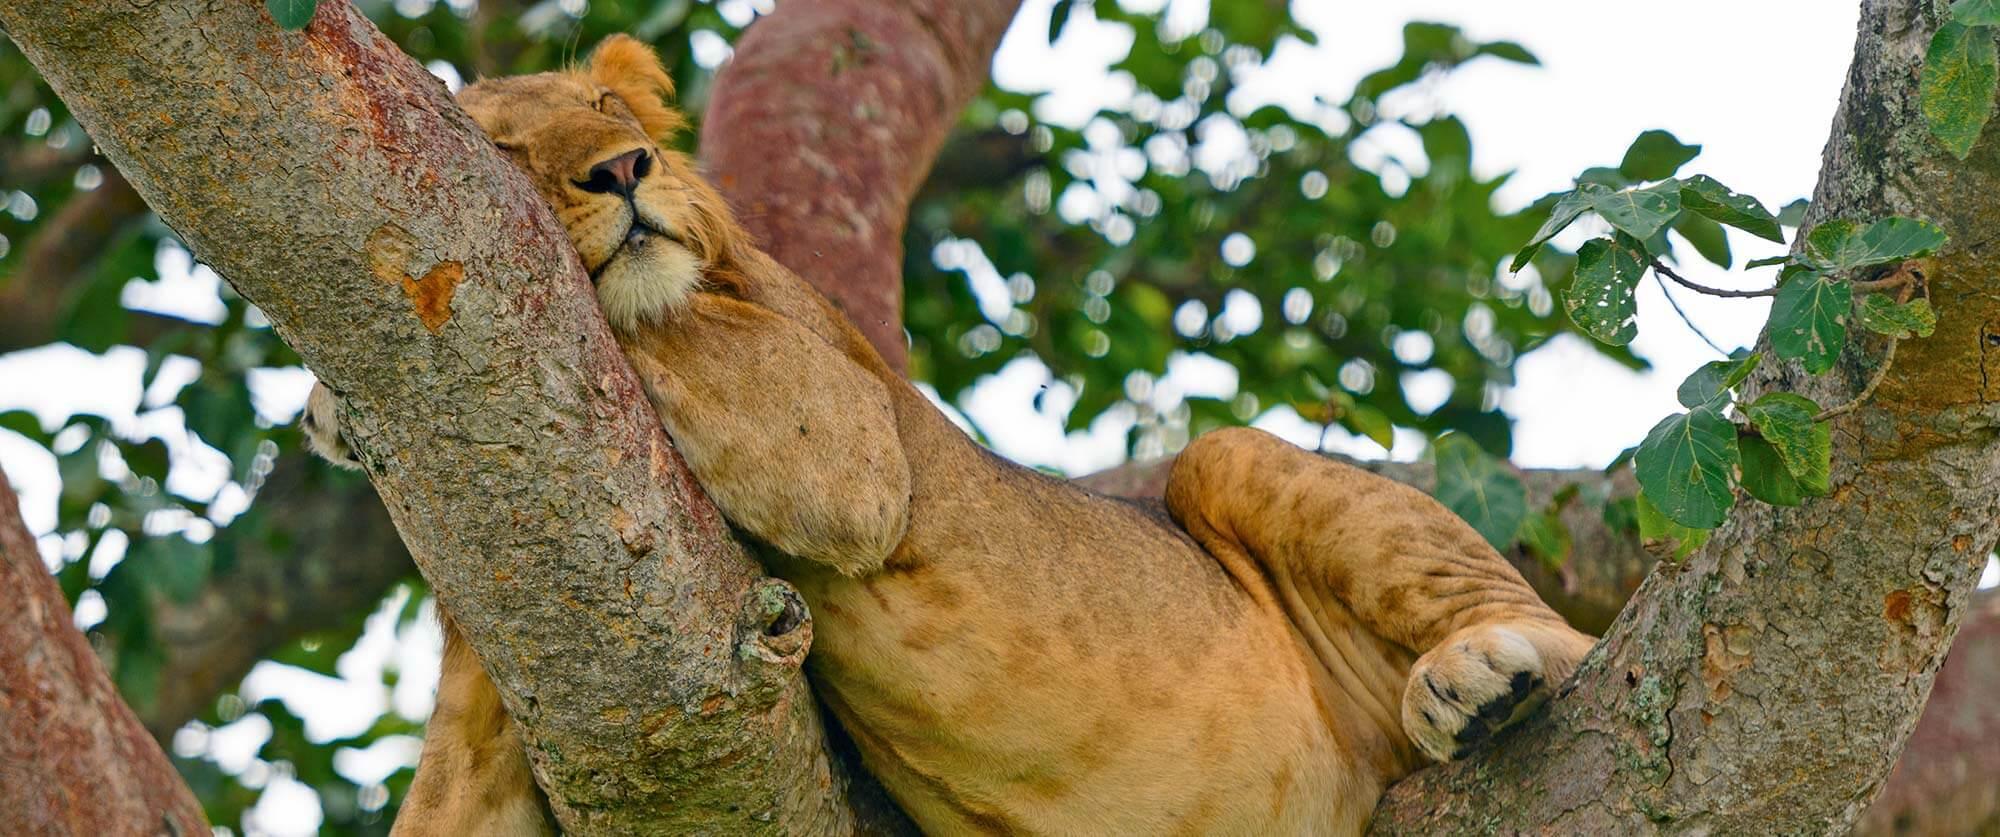 Tree Climbing Lions in Ishasha, Uganda - Bwindi Impenetrable National Park - Uganda and Rwanda Gorilla Trekking Tour